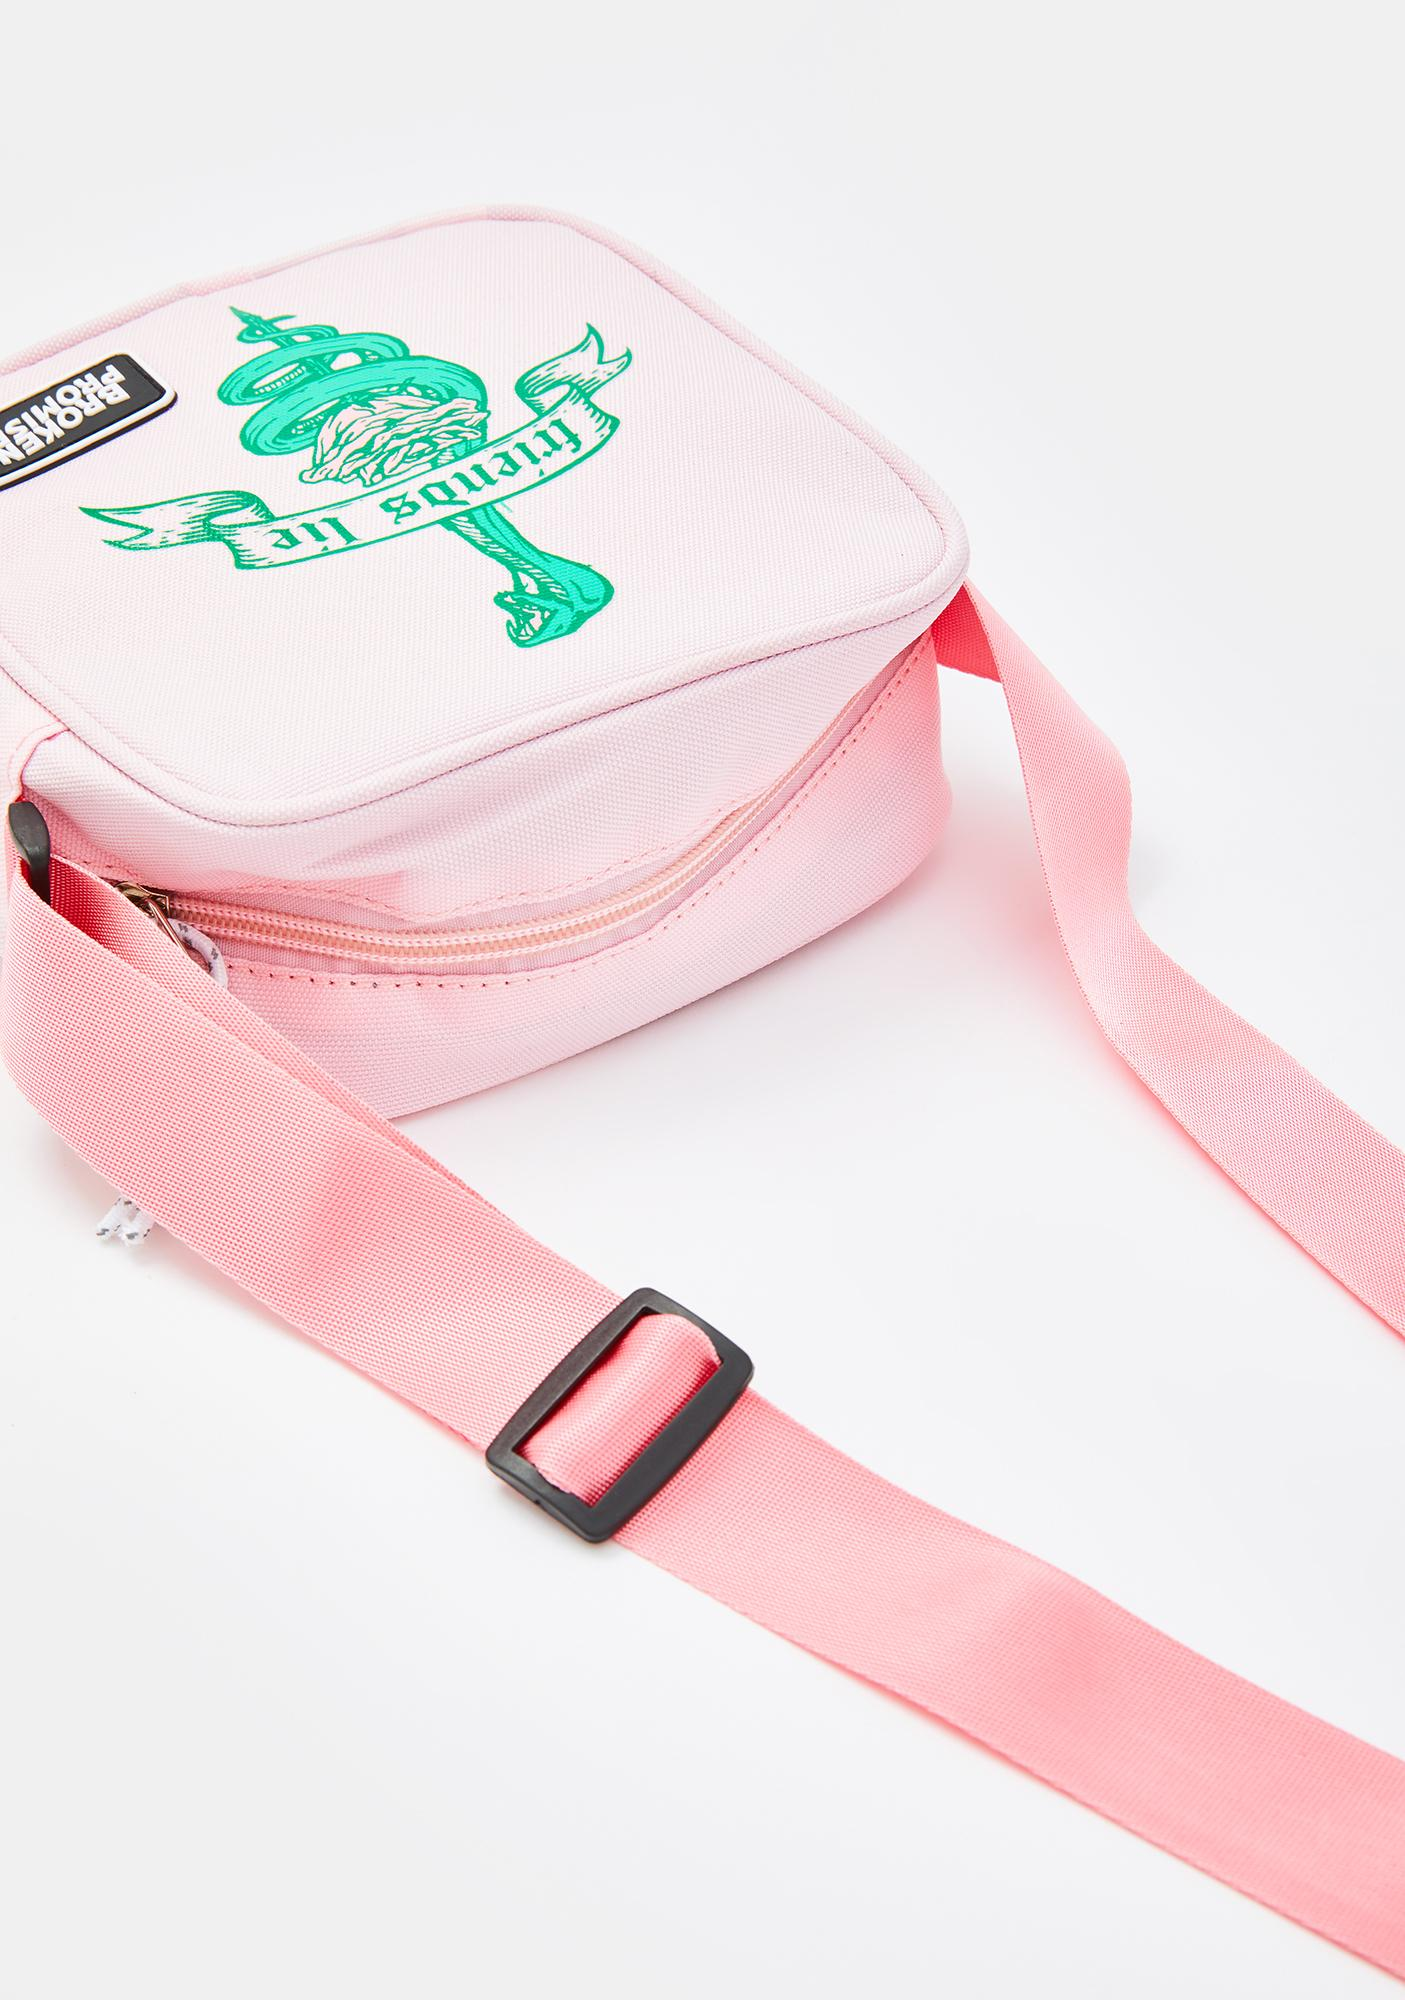 BROKEN PROMISES CO Friends Lie Mini Crossbody Bag